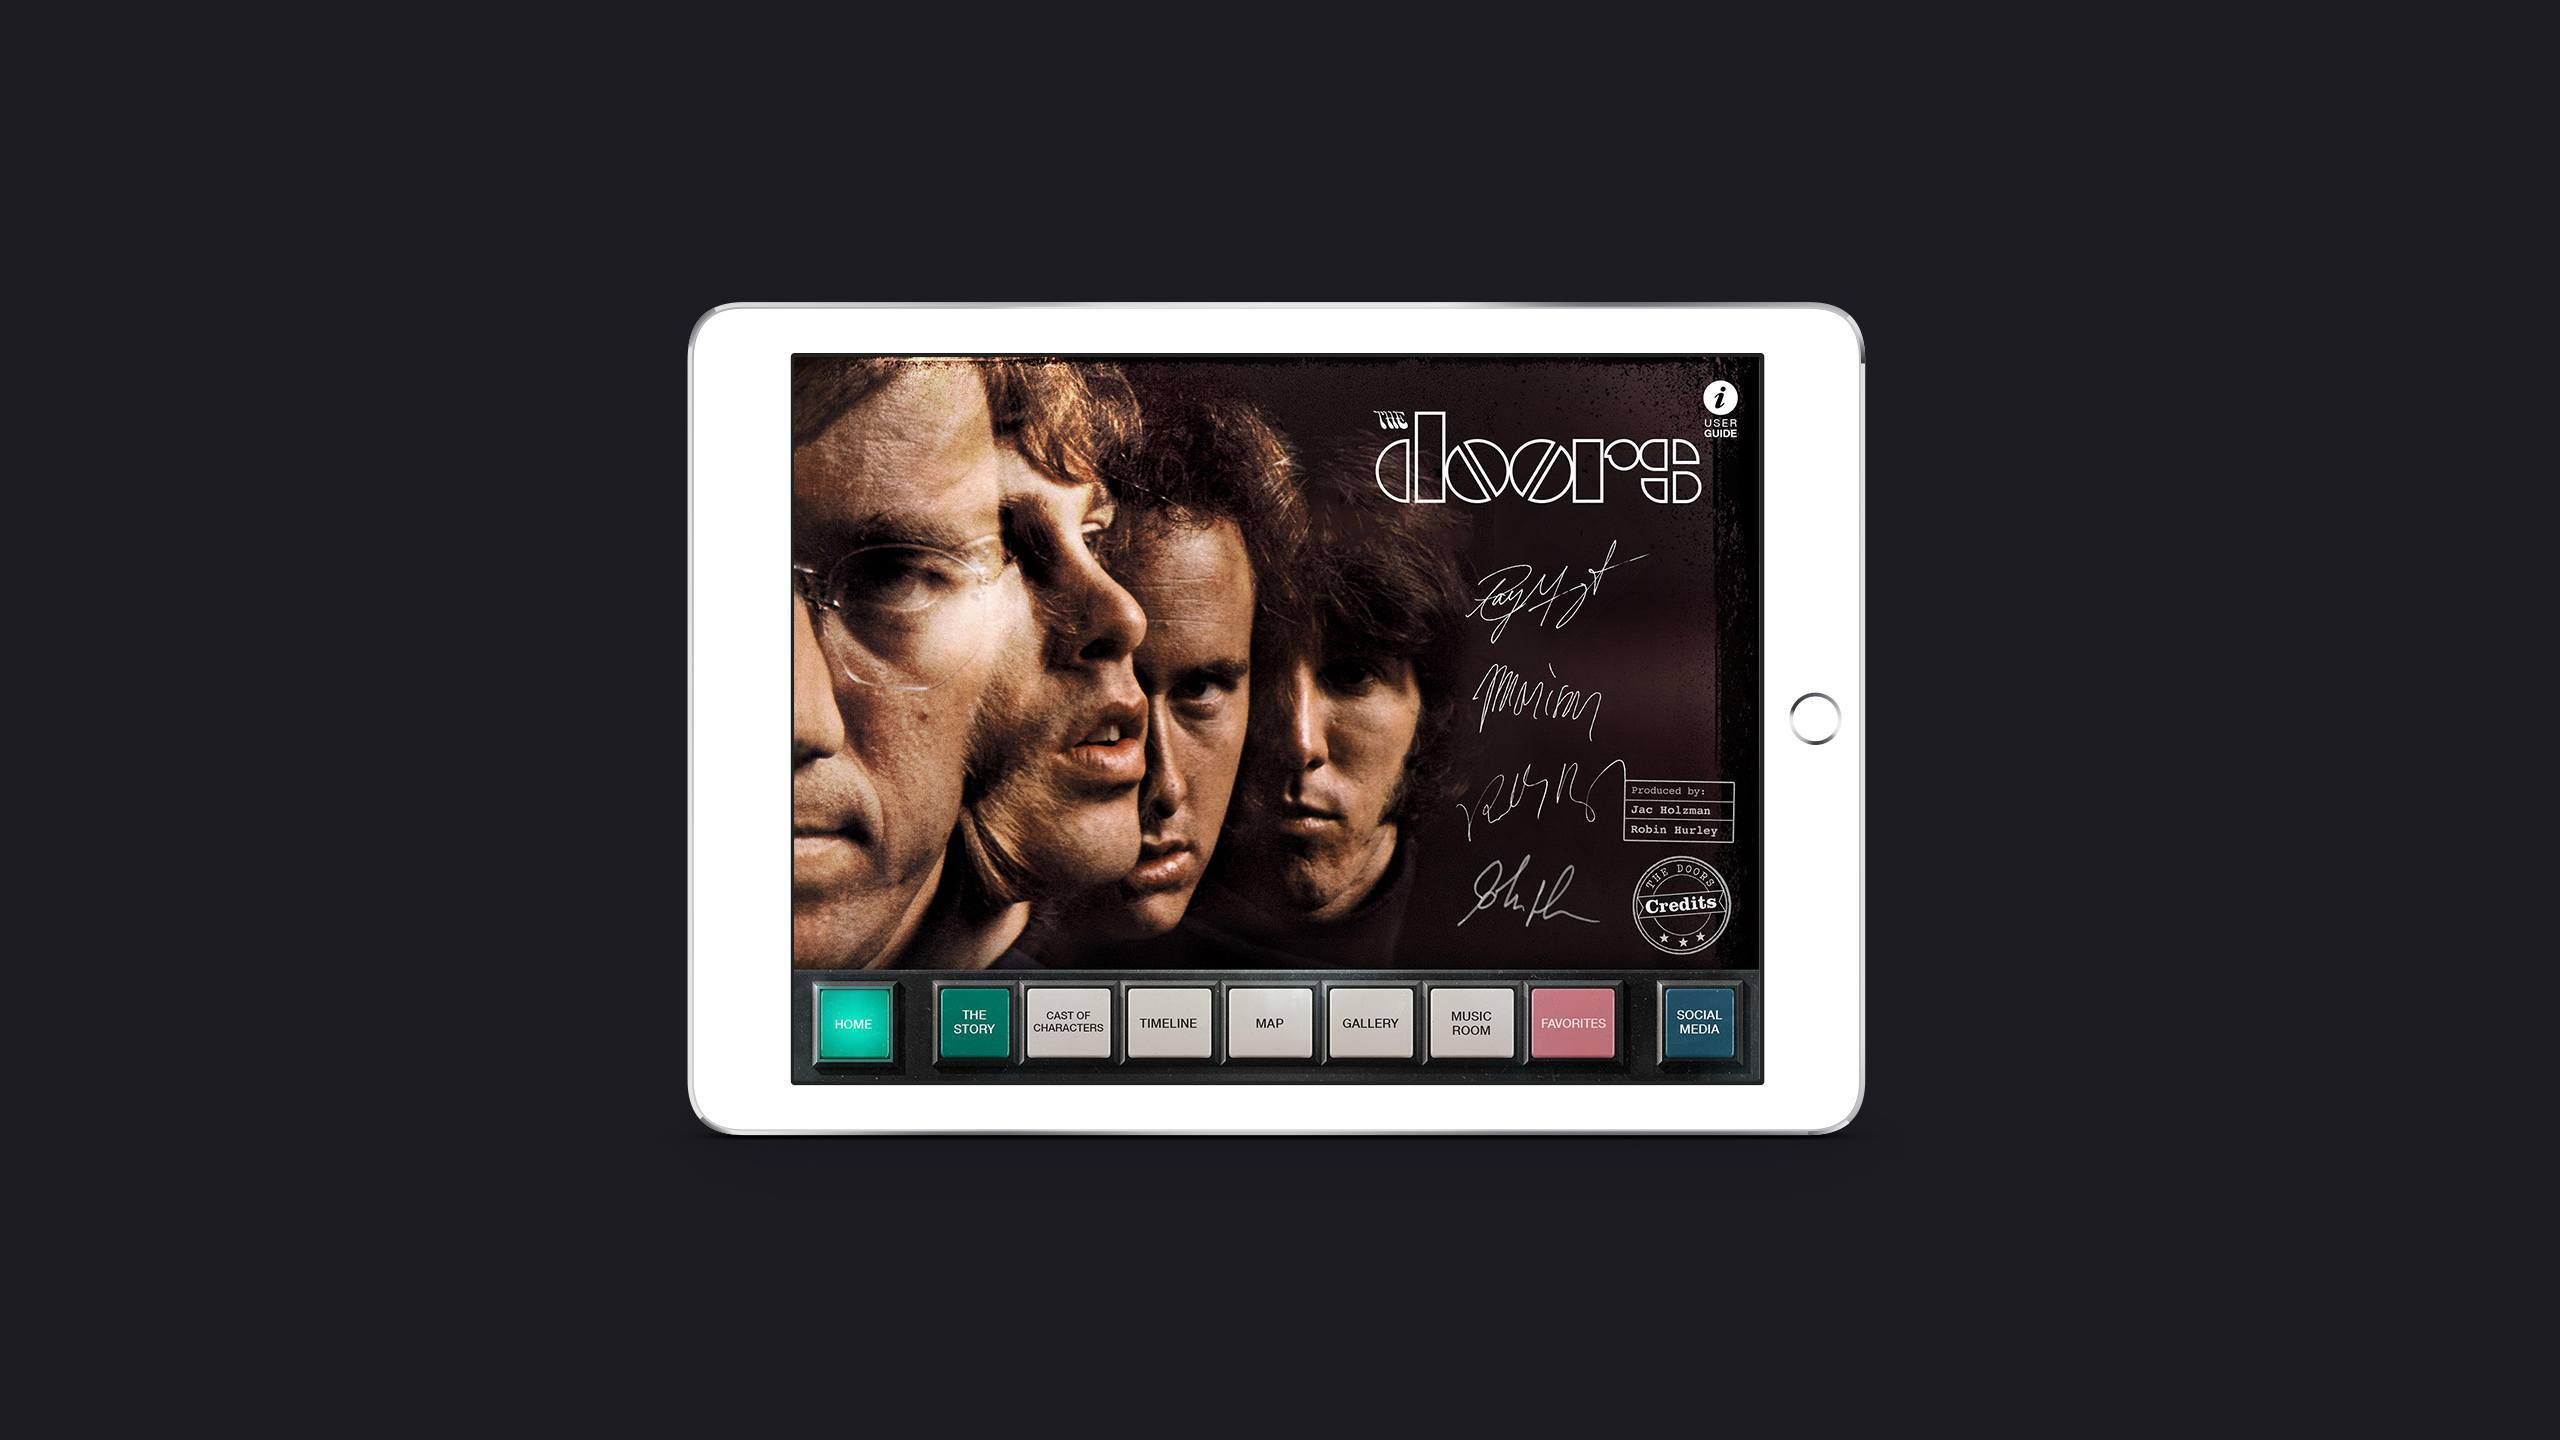 The Doors iPad app